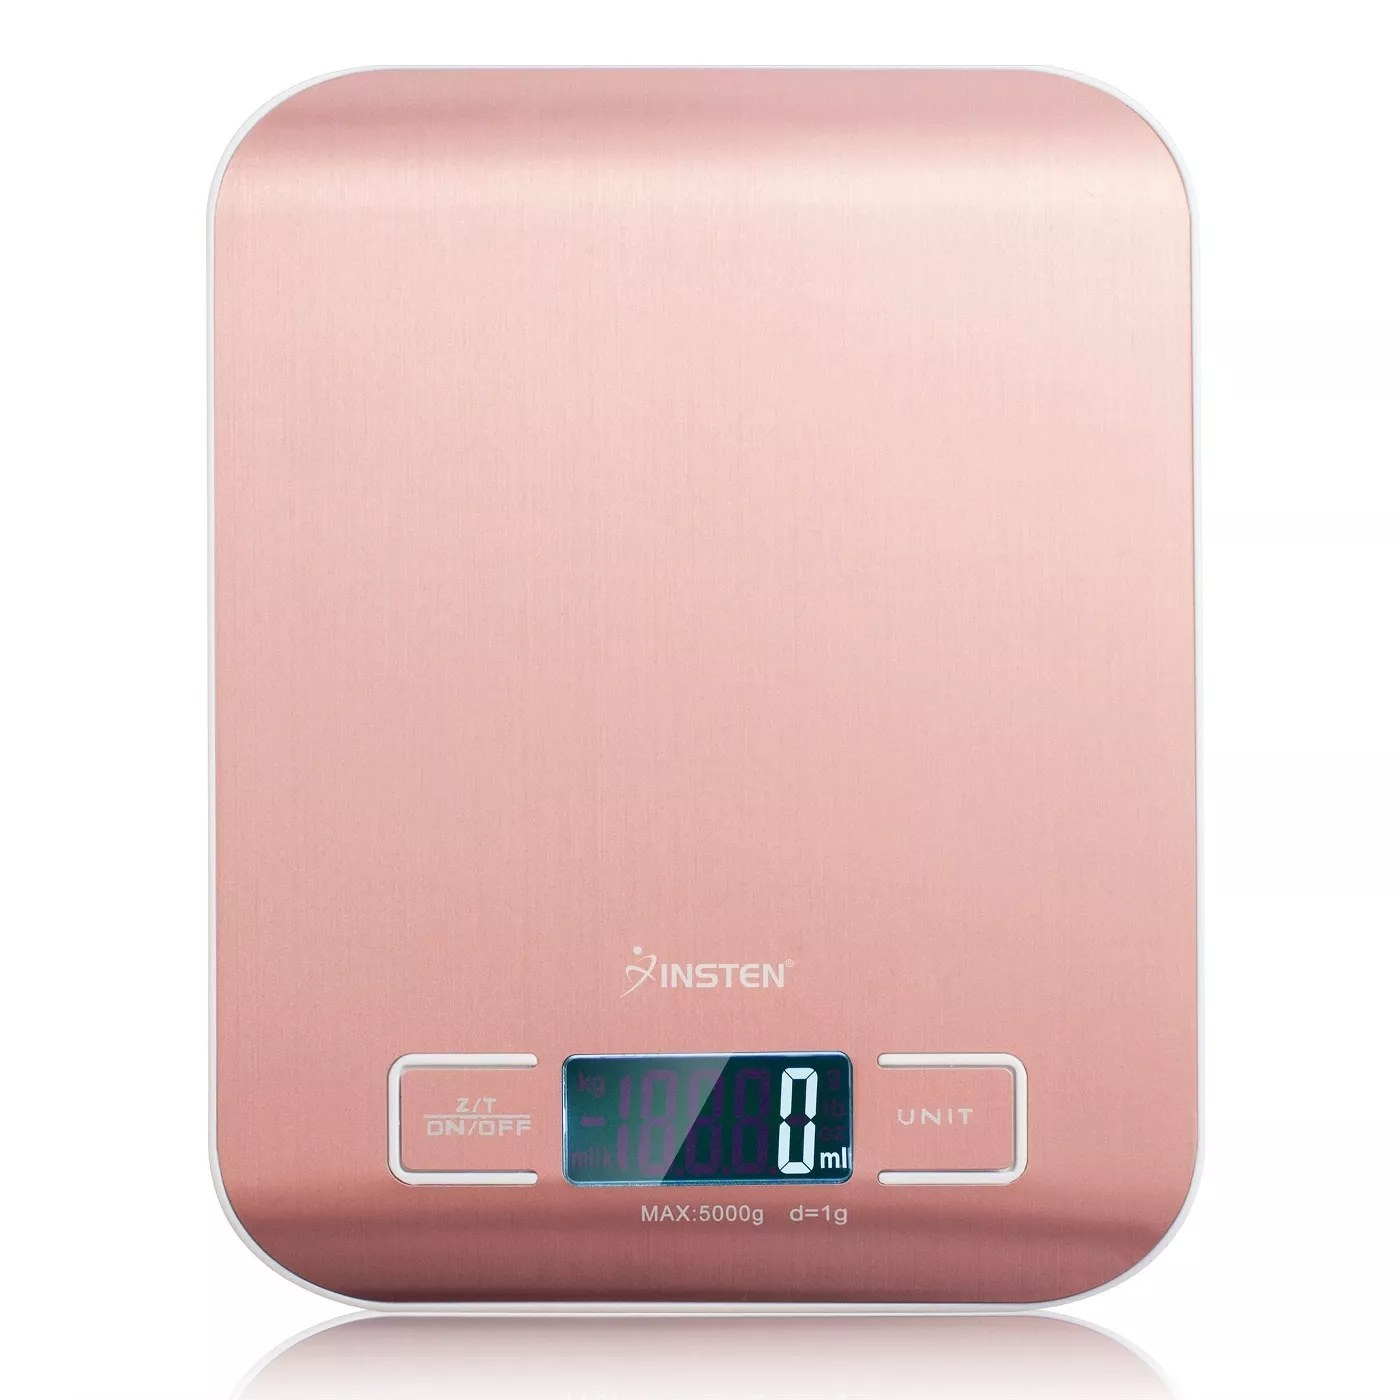 The pink, digital, Insten scale